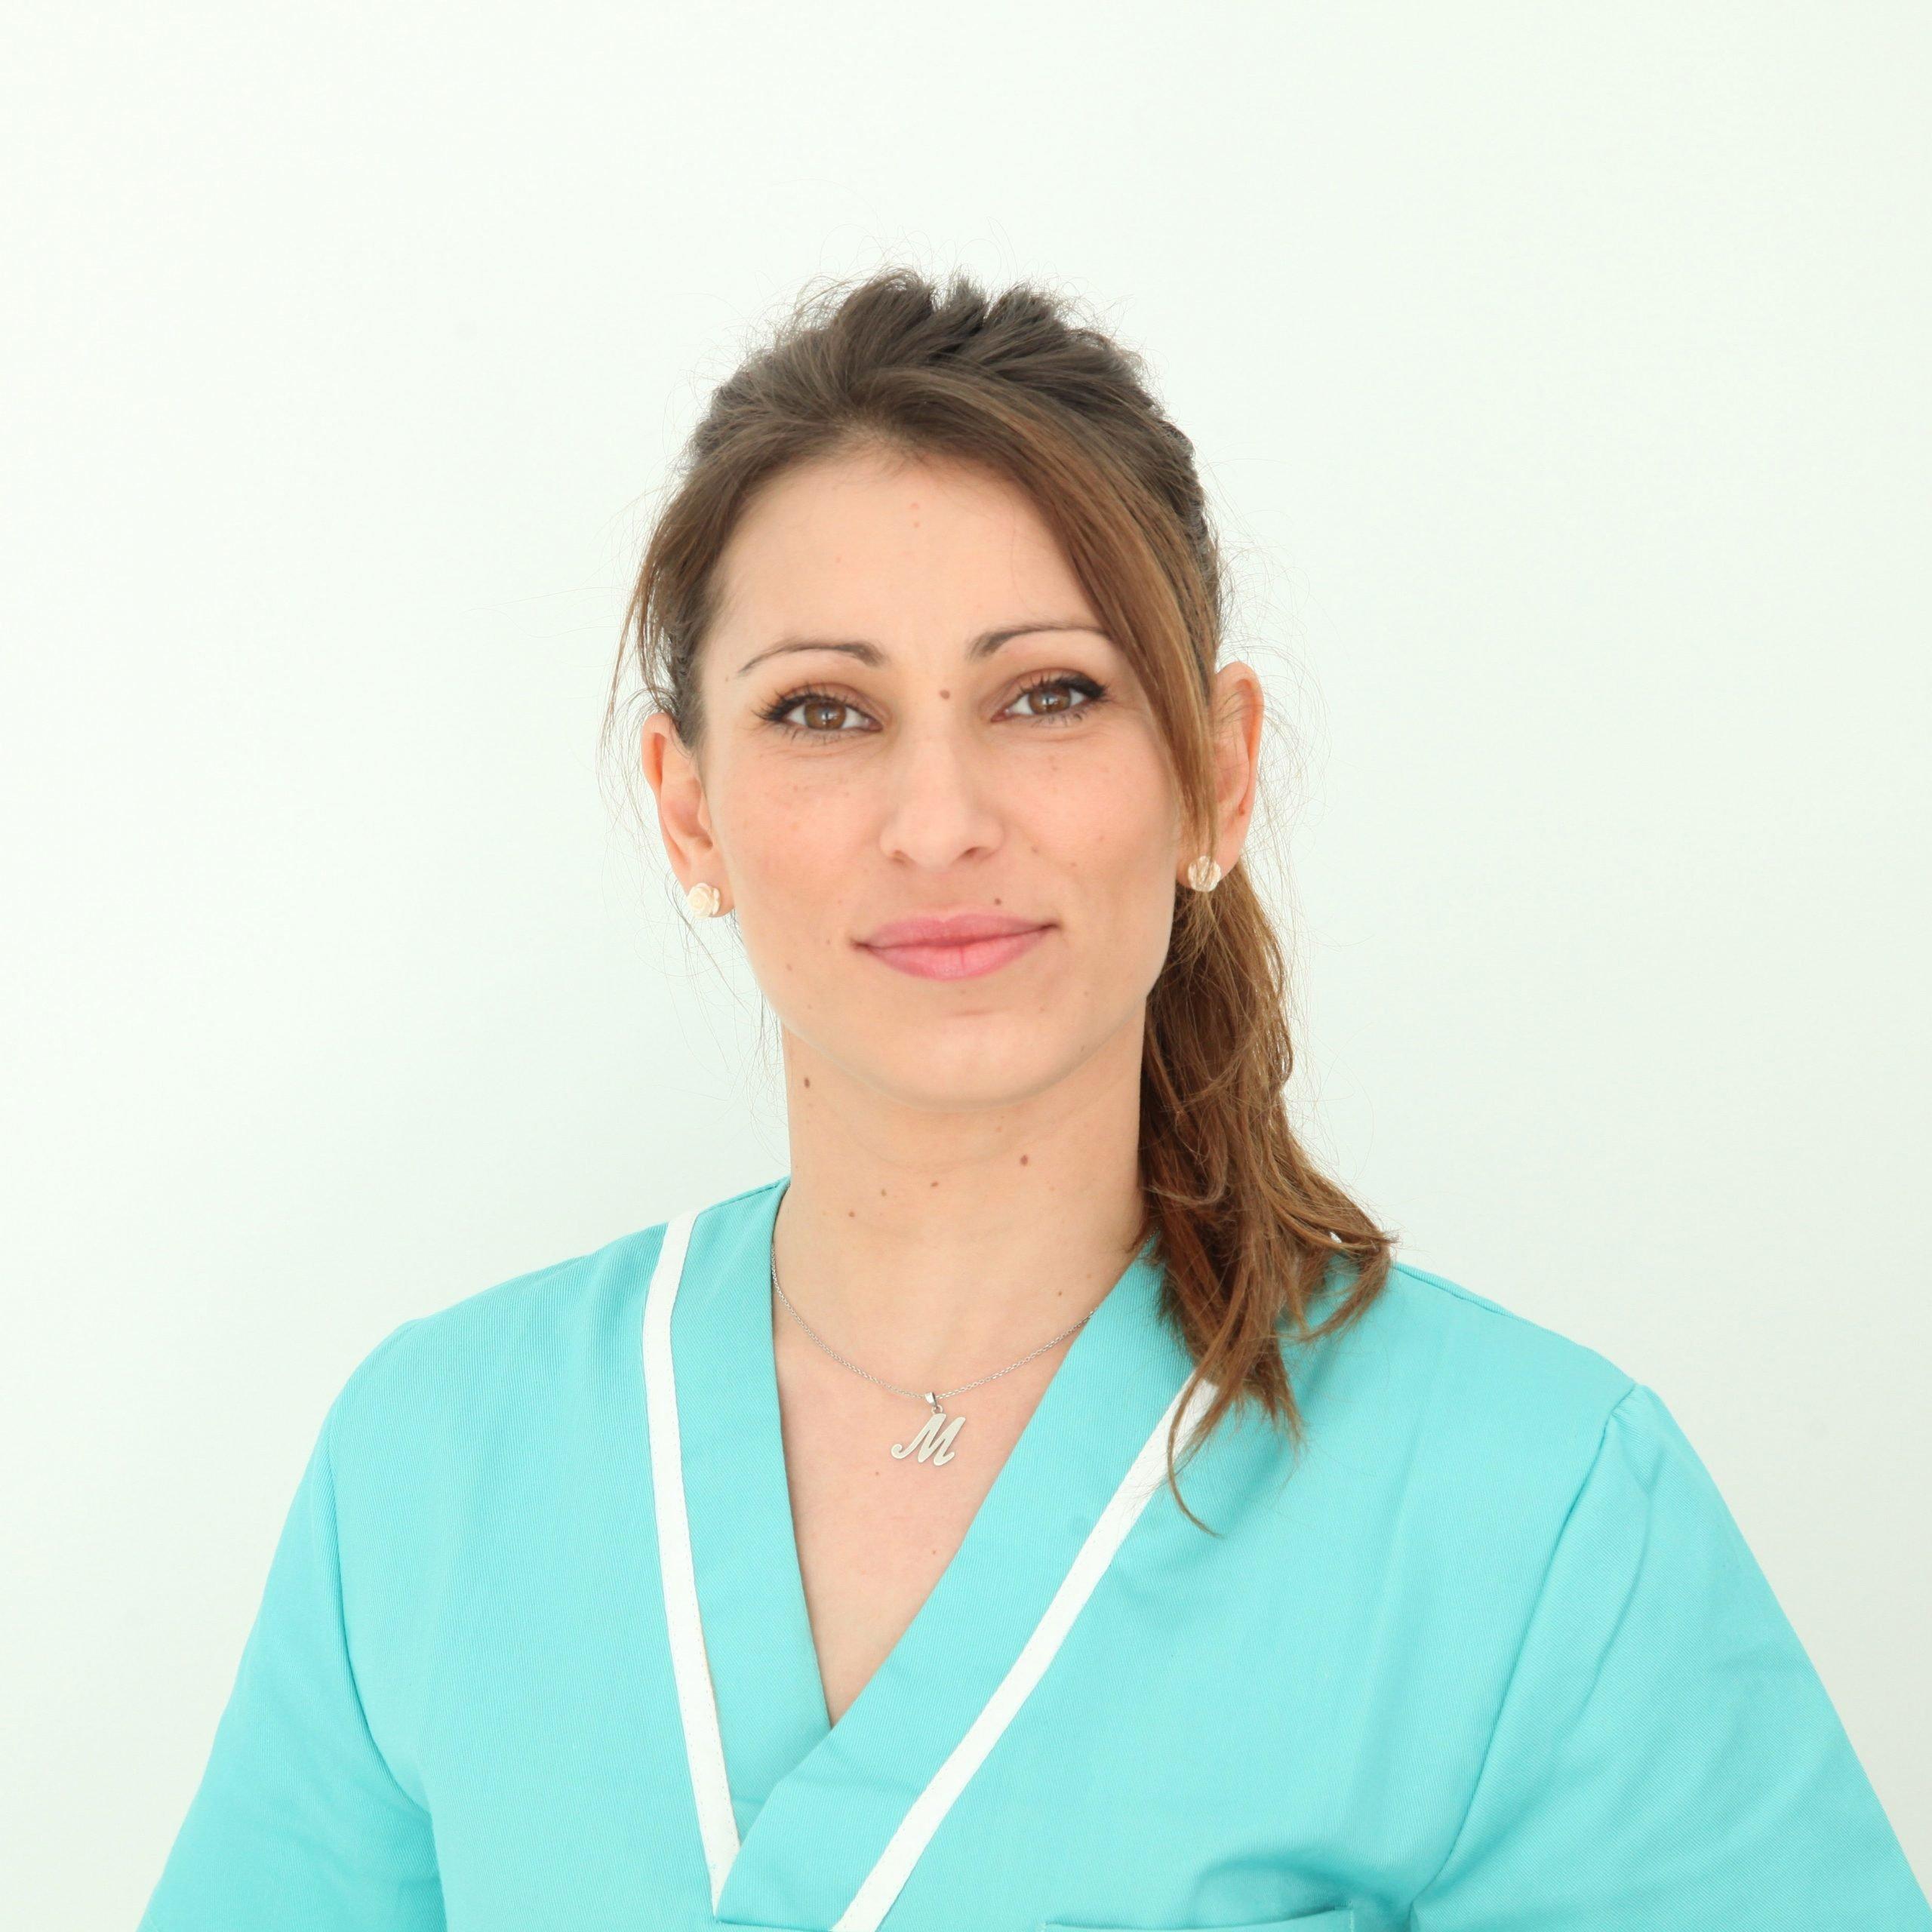 Mónica Moraru-Auxiliar enfermería